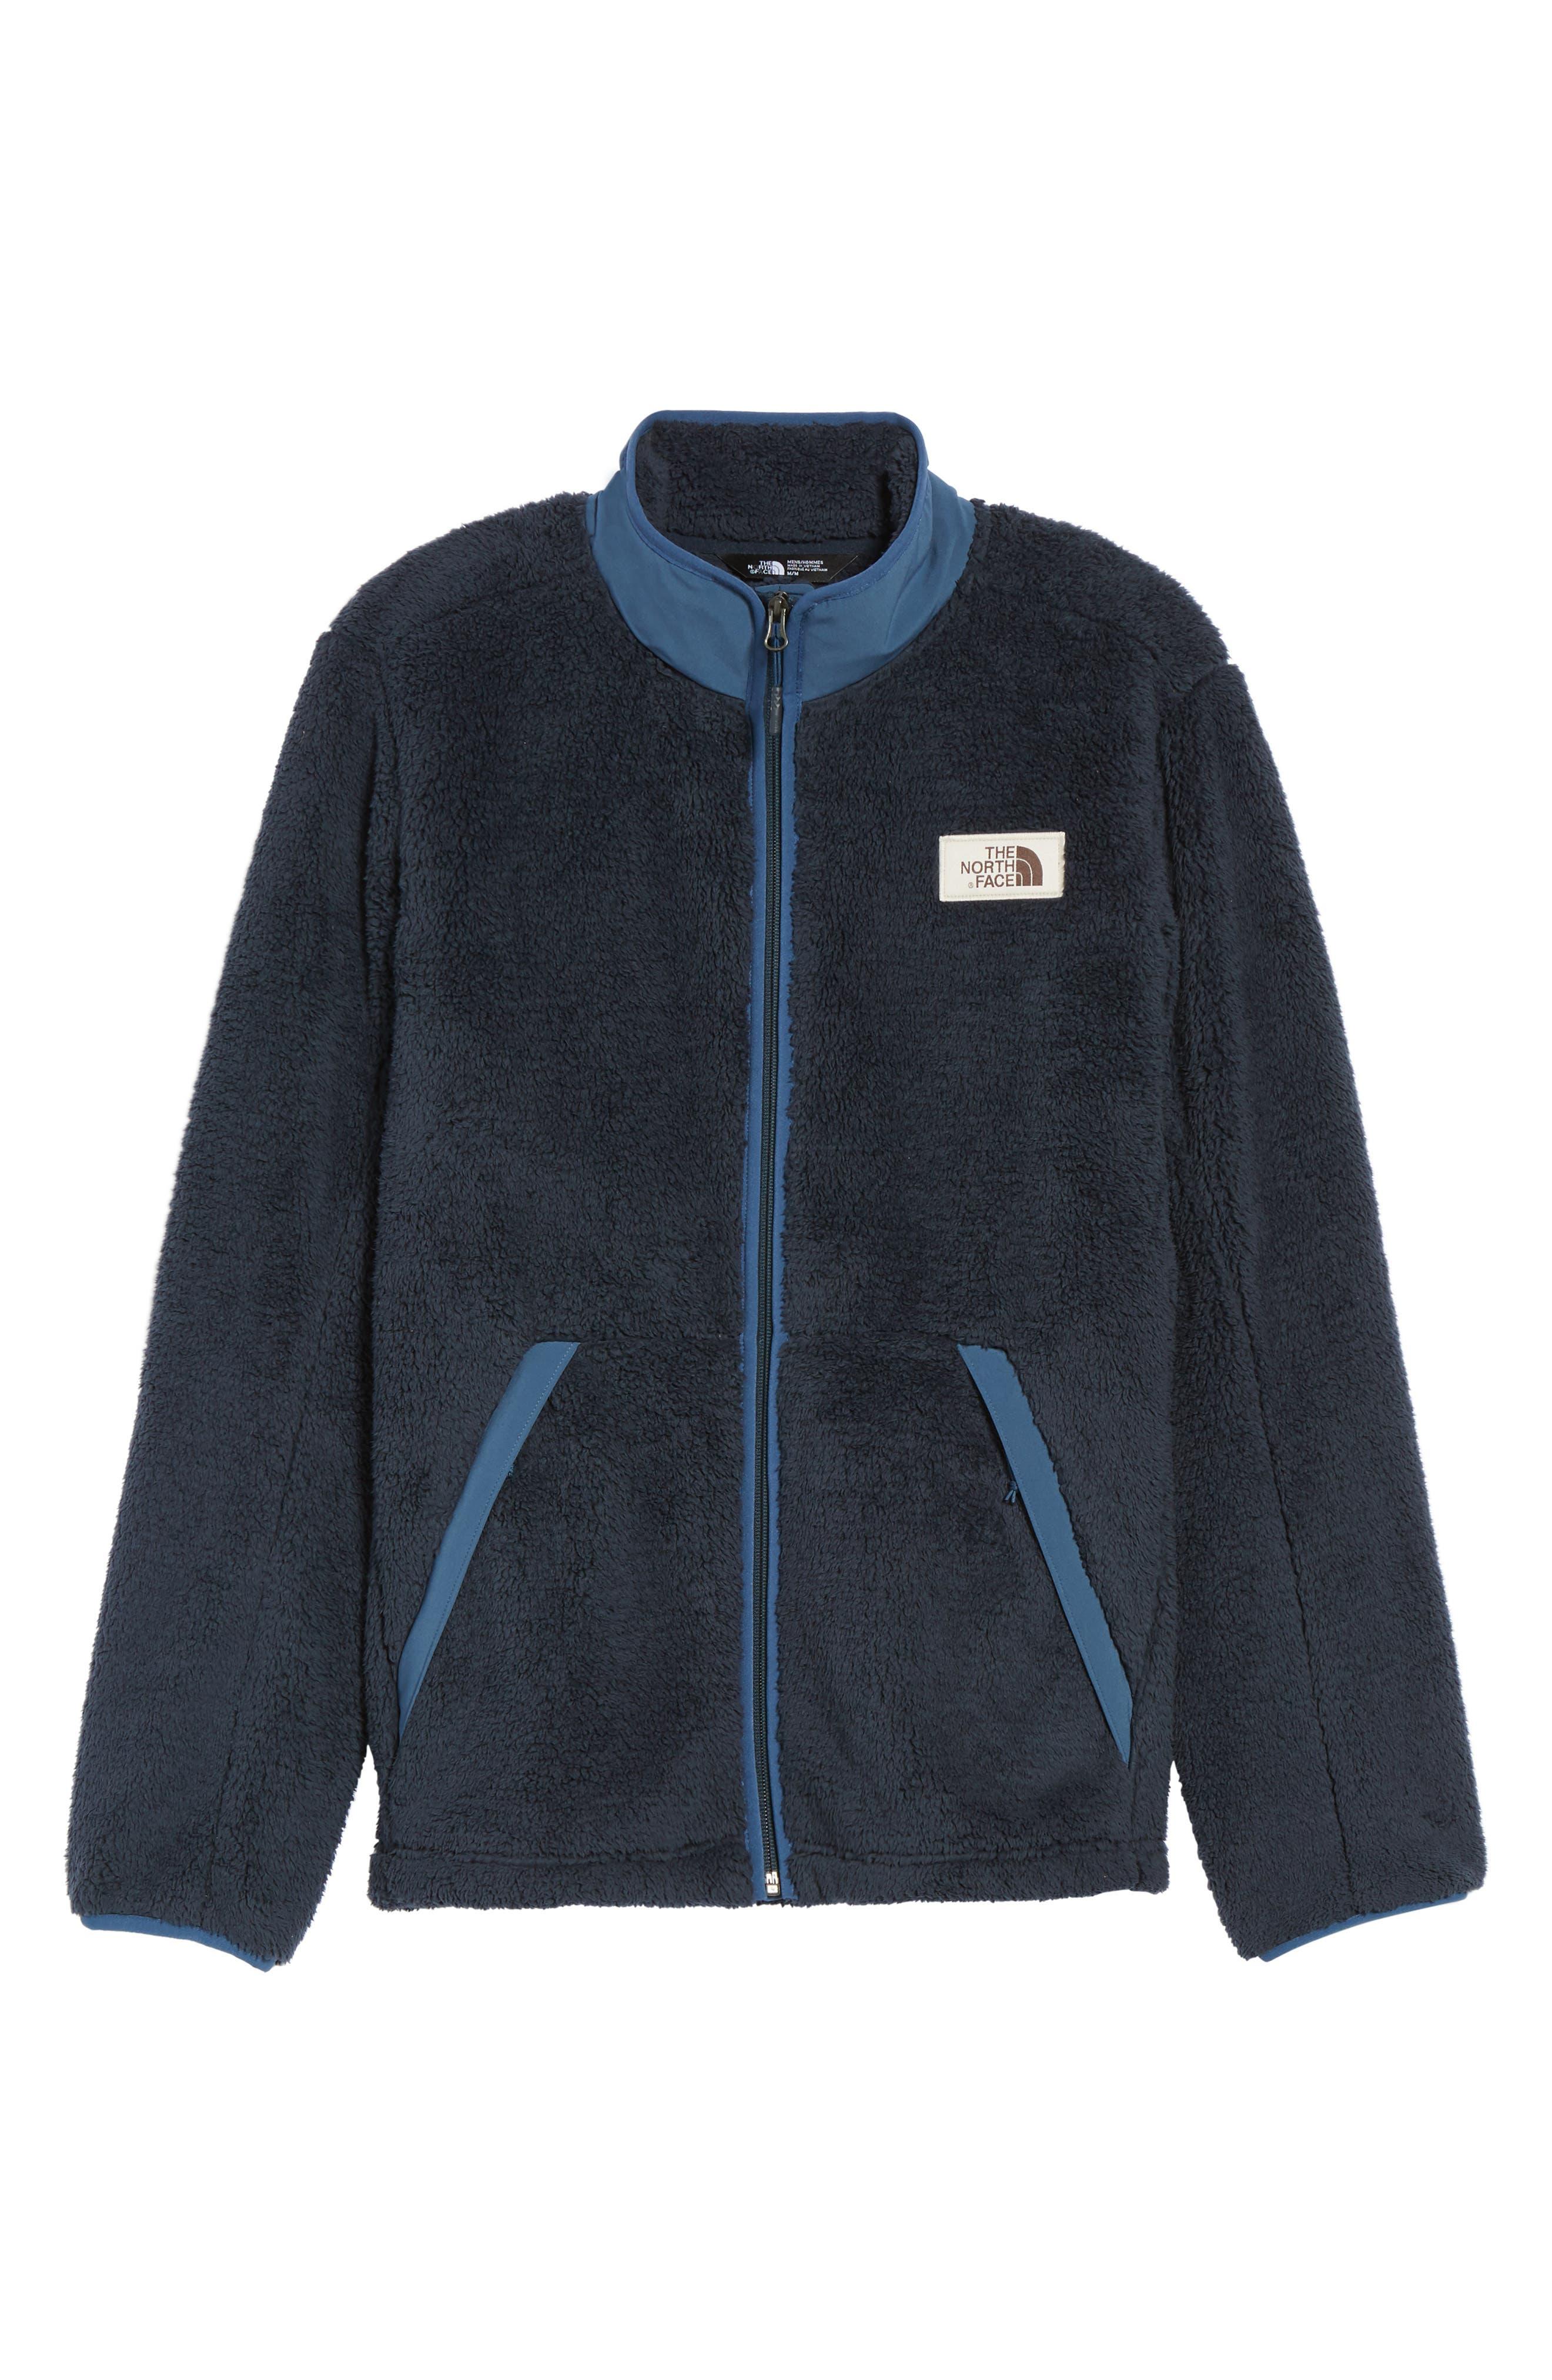 Campshire Zip Fleece Jacket,                             Alternate thumbnail 59, color,